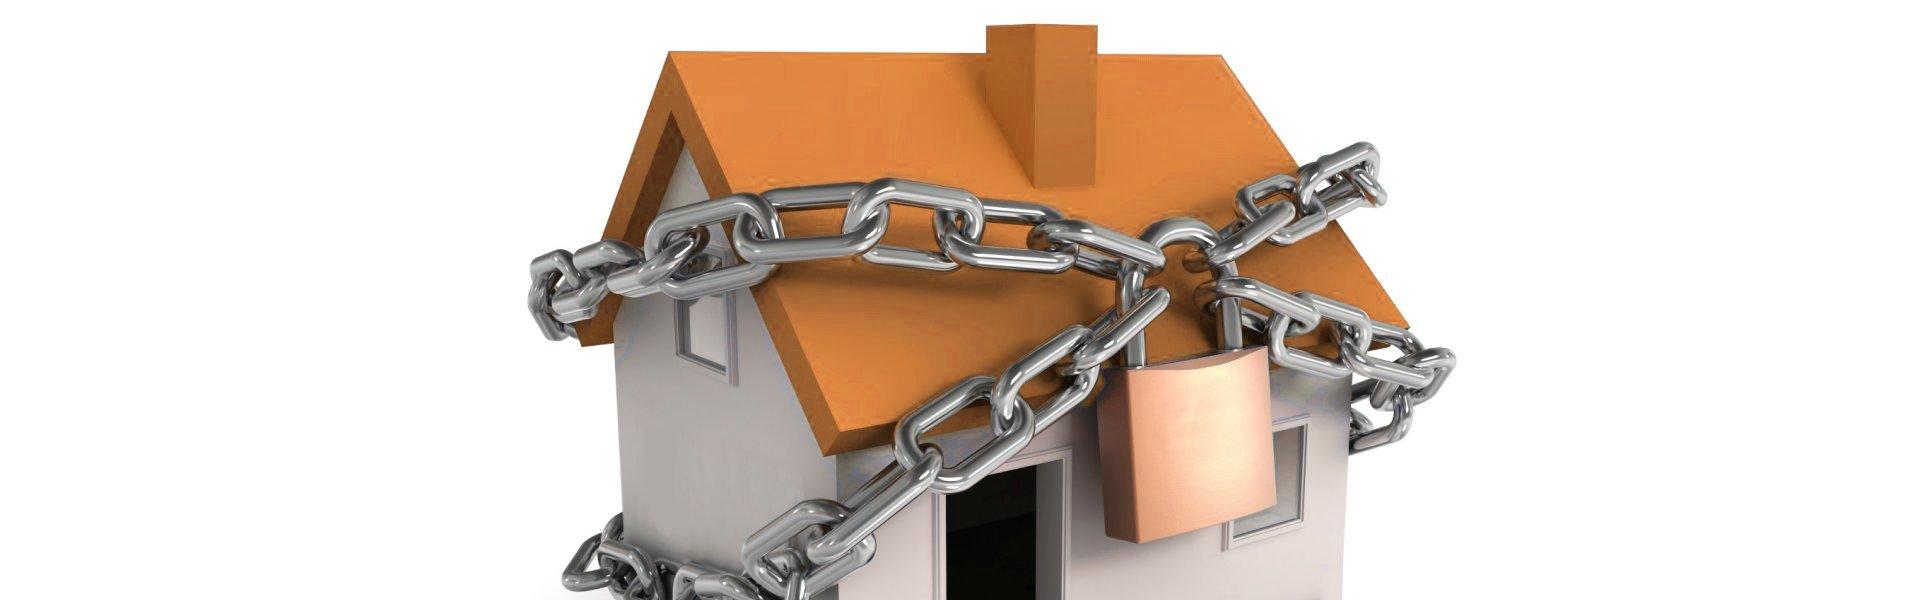 House Sale Broken Chain